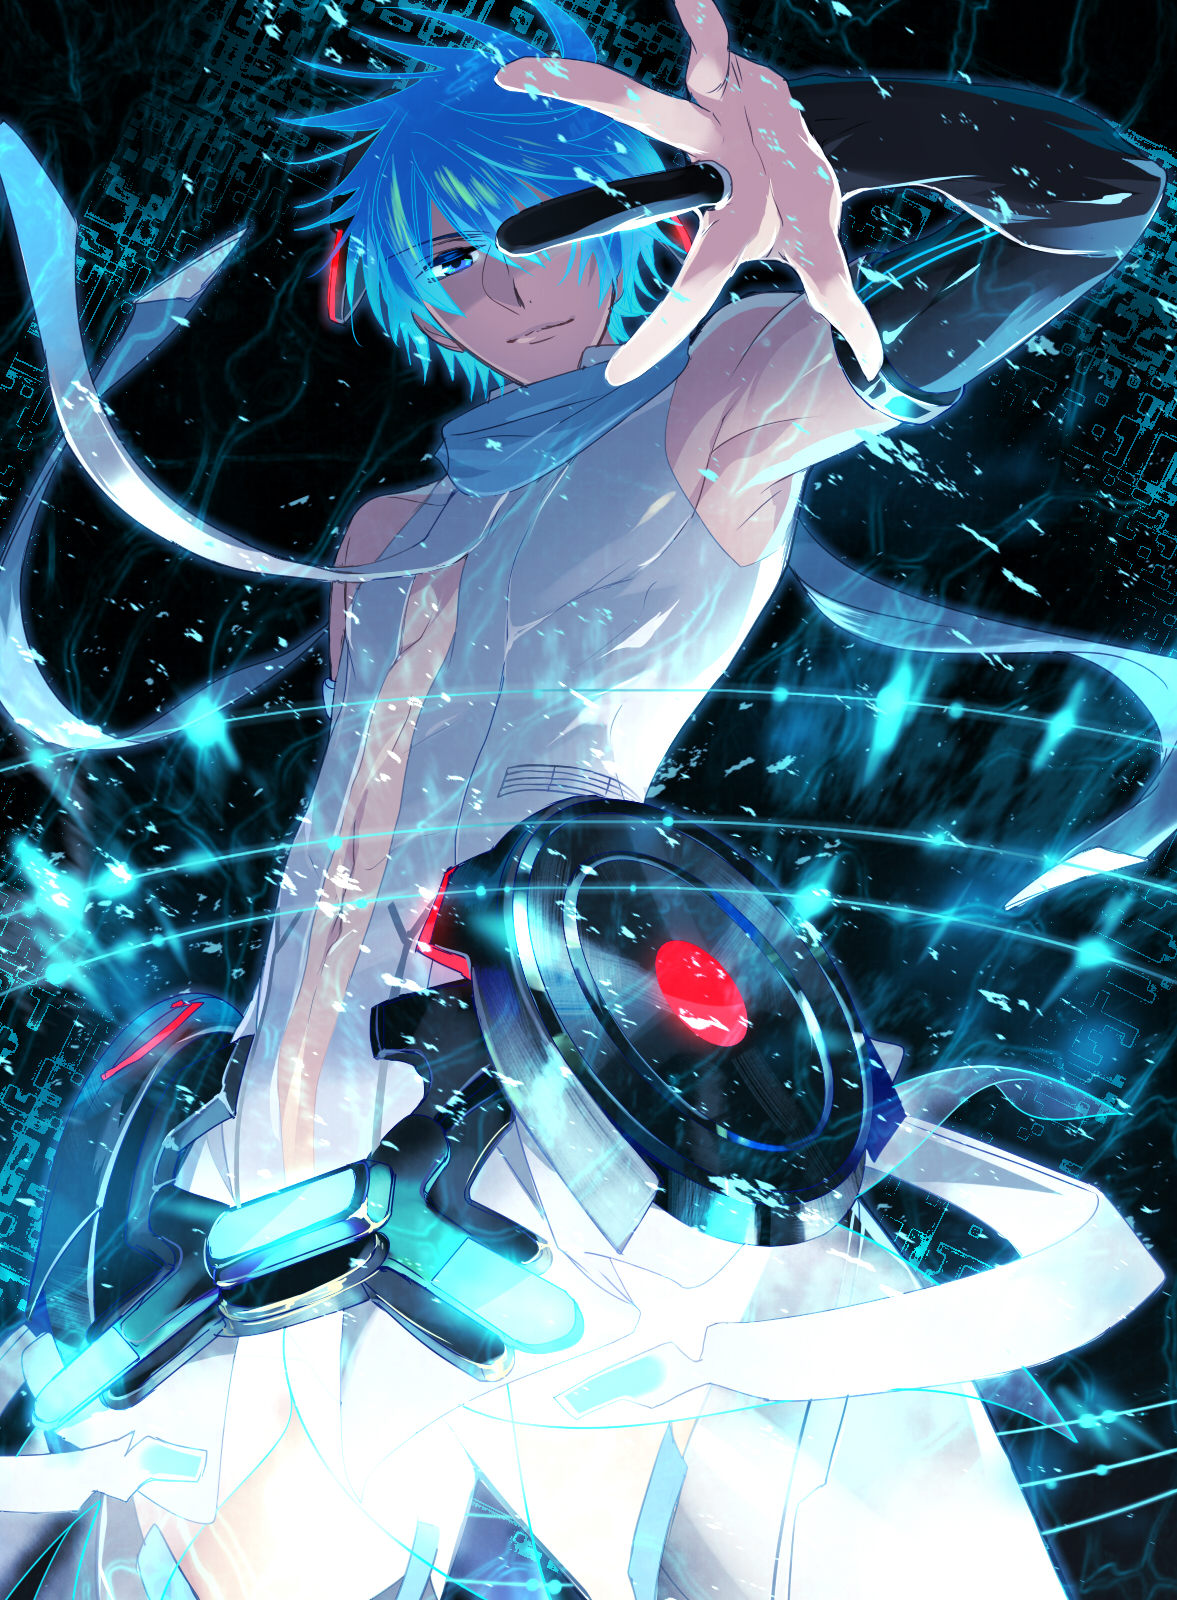 KAITO - VOCALOID | page 9 of 161 - Zerochan Anime Image BoardVocaloid Kaito